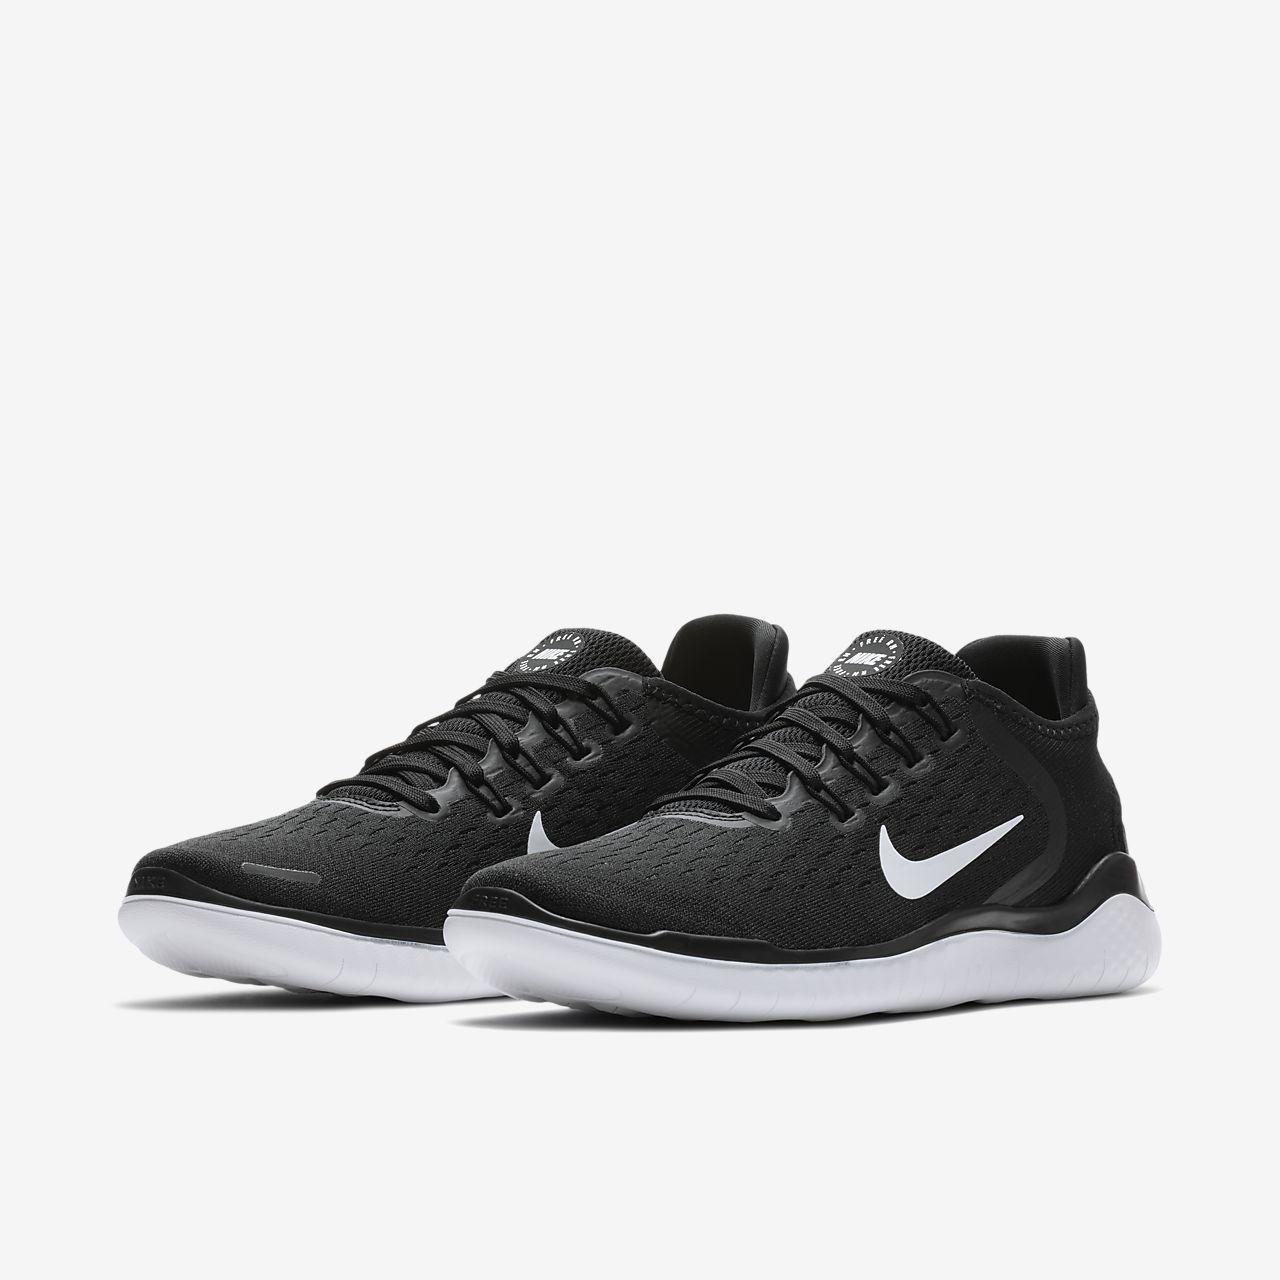 best website 4bc64 821df Nike Free RN 2018 Women's Running Shoe